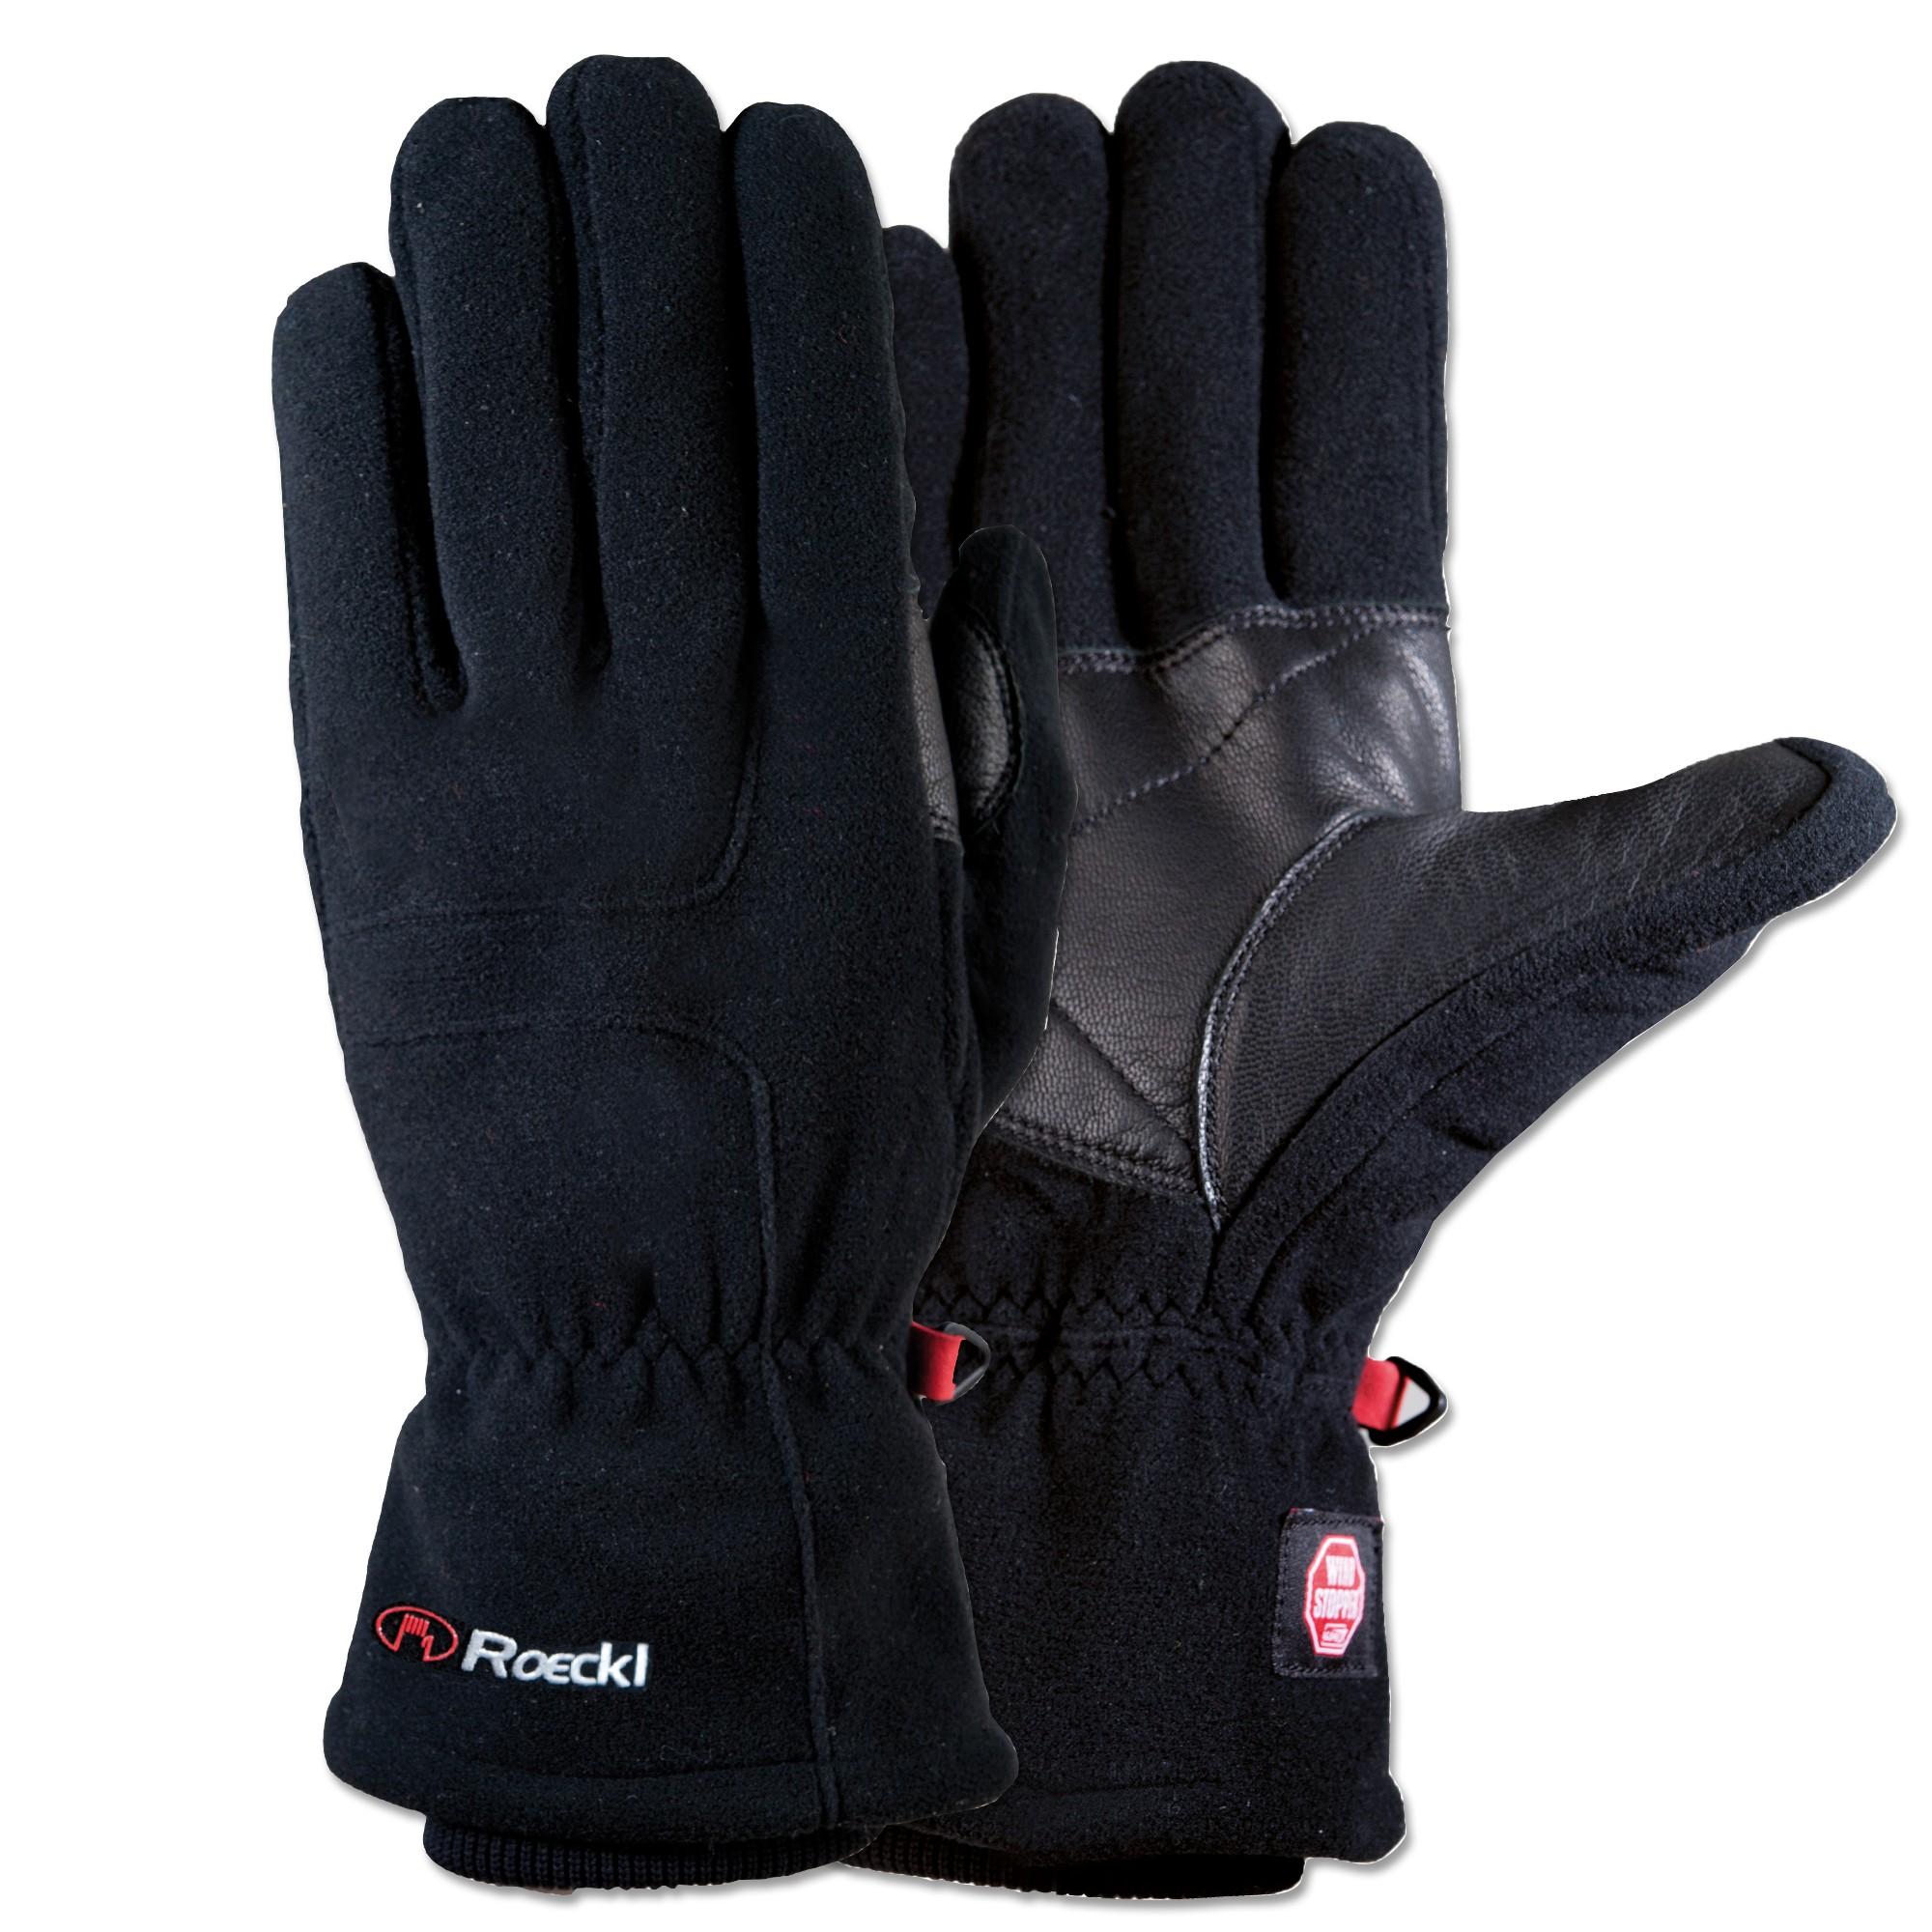 Handschuhe Roeckl Kodal schwarz